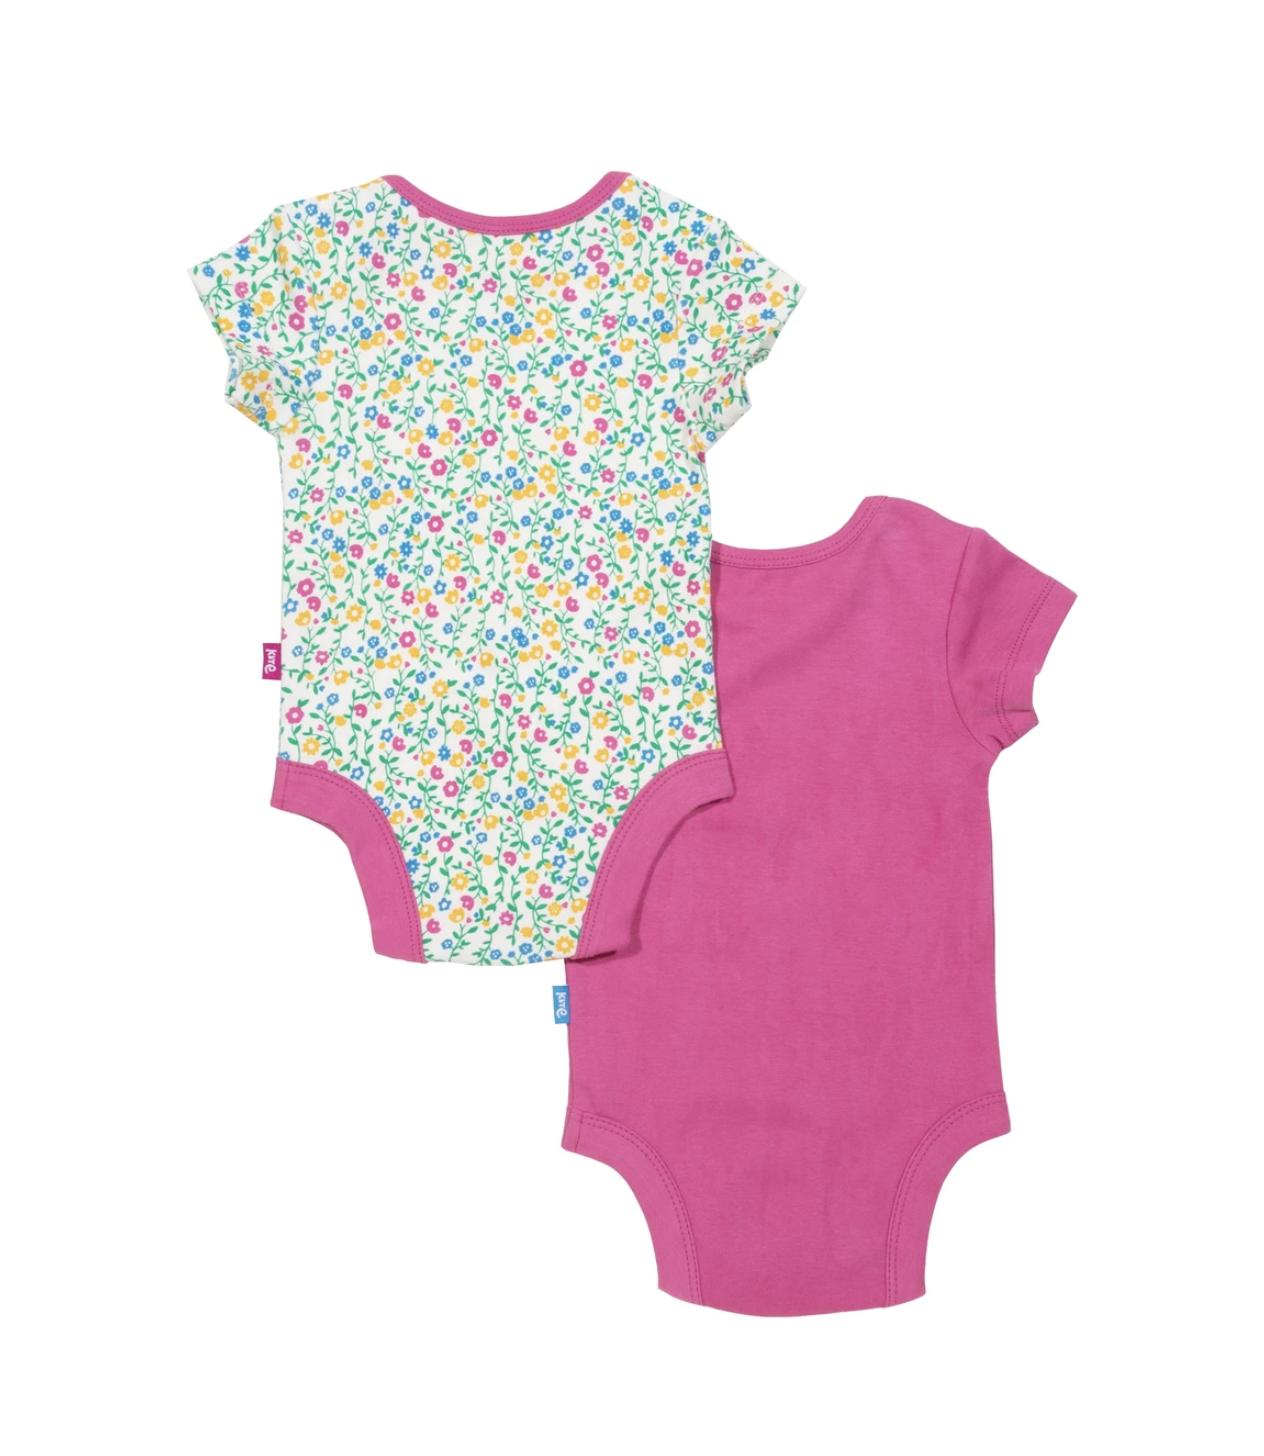 Kite Organic Cotton Polka Dot Rose Bodysuits 2 PackNewborn